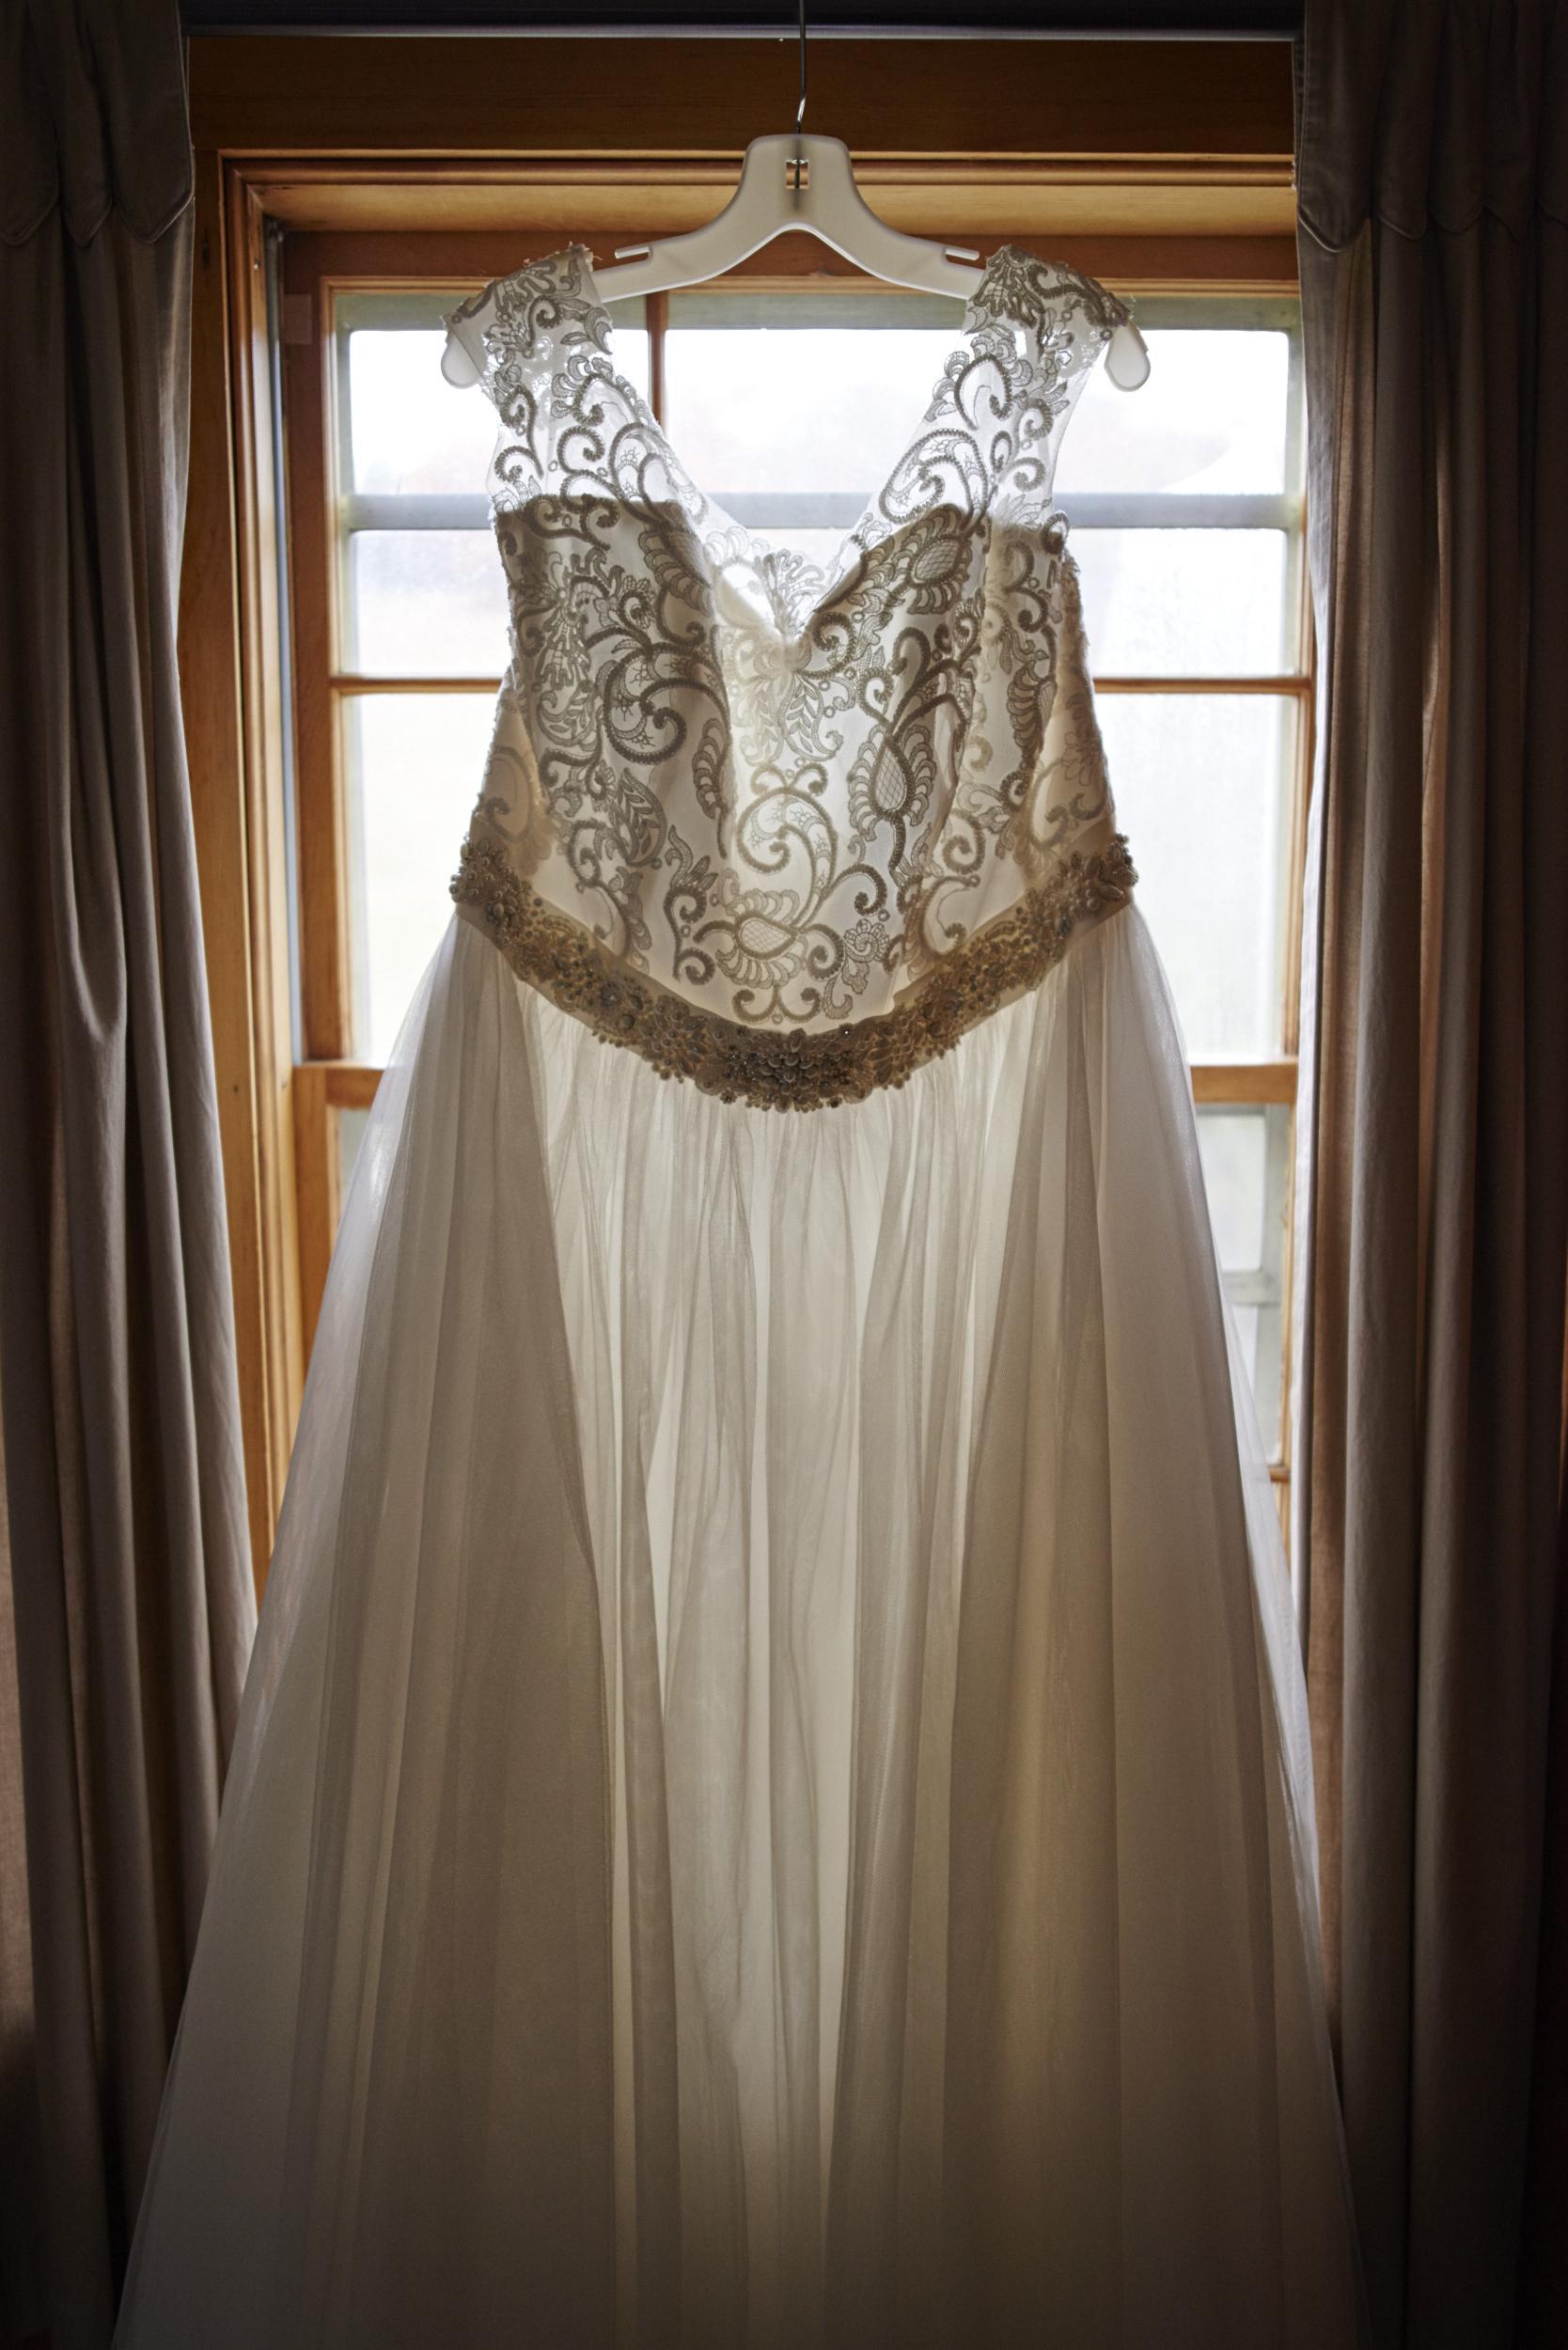 Top New Hampshire Wedding Photographer Wedding Dress